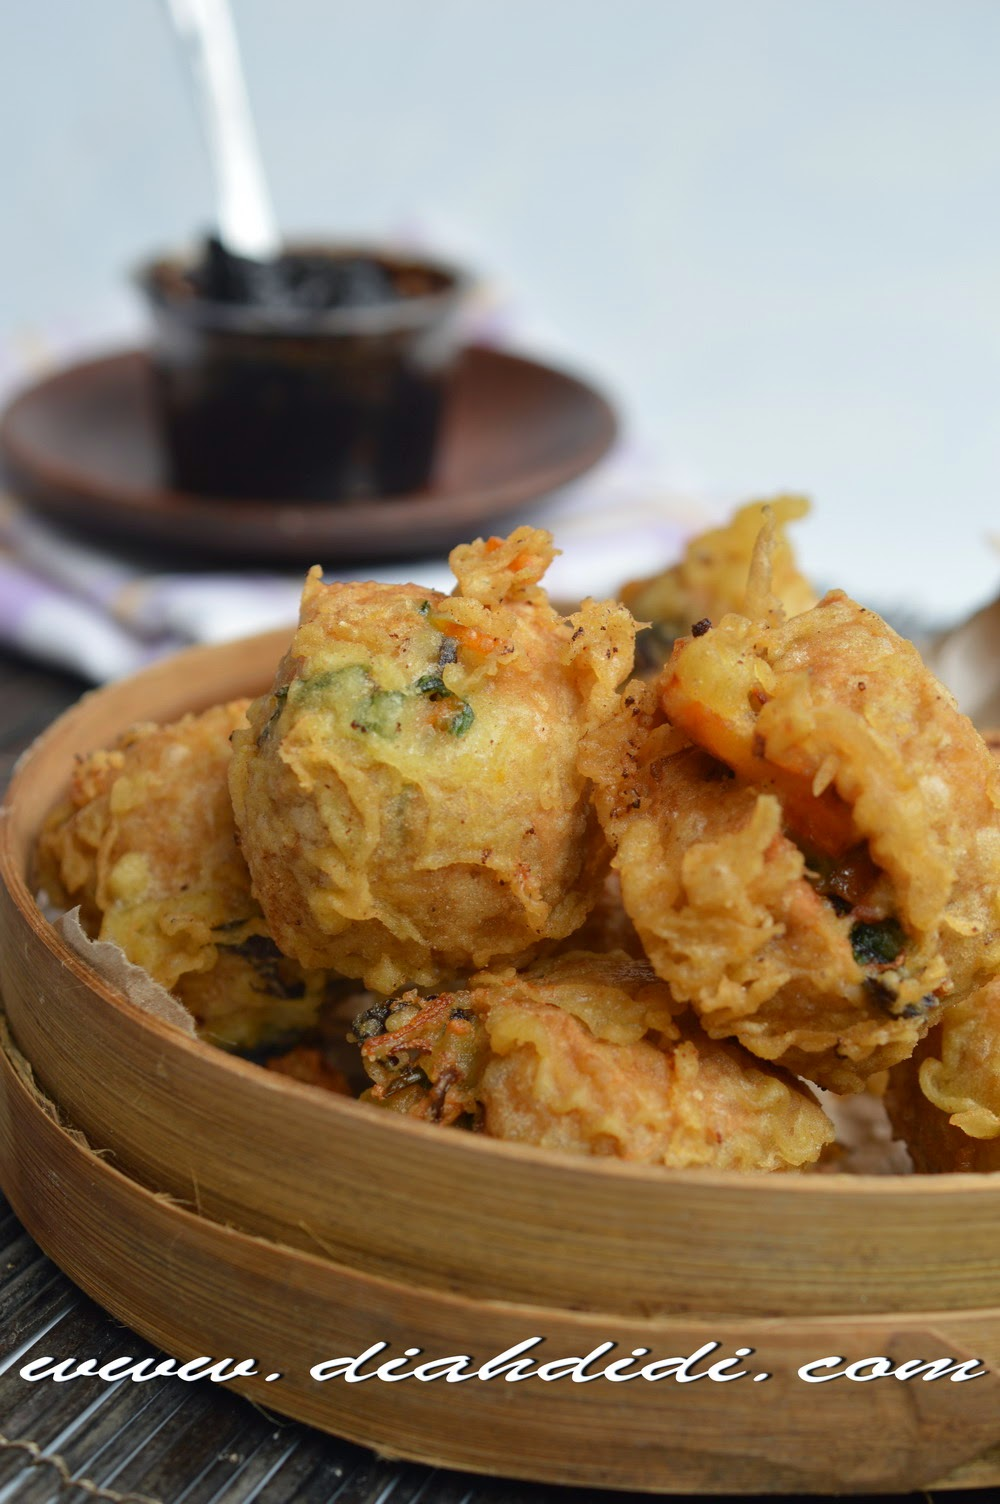 Resep Tahu Isi Mercon : resep, mercon, Didi's, Kitchen:, Mercon